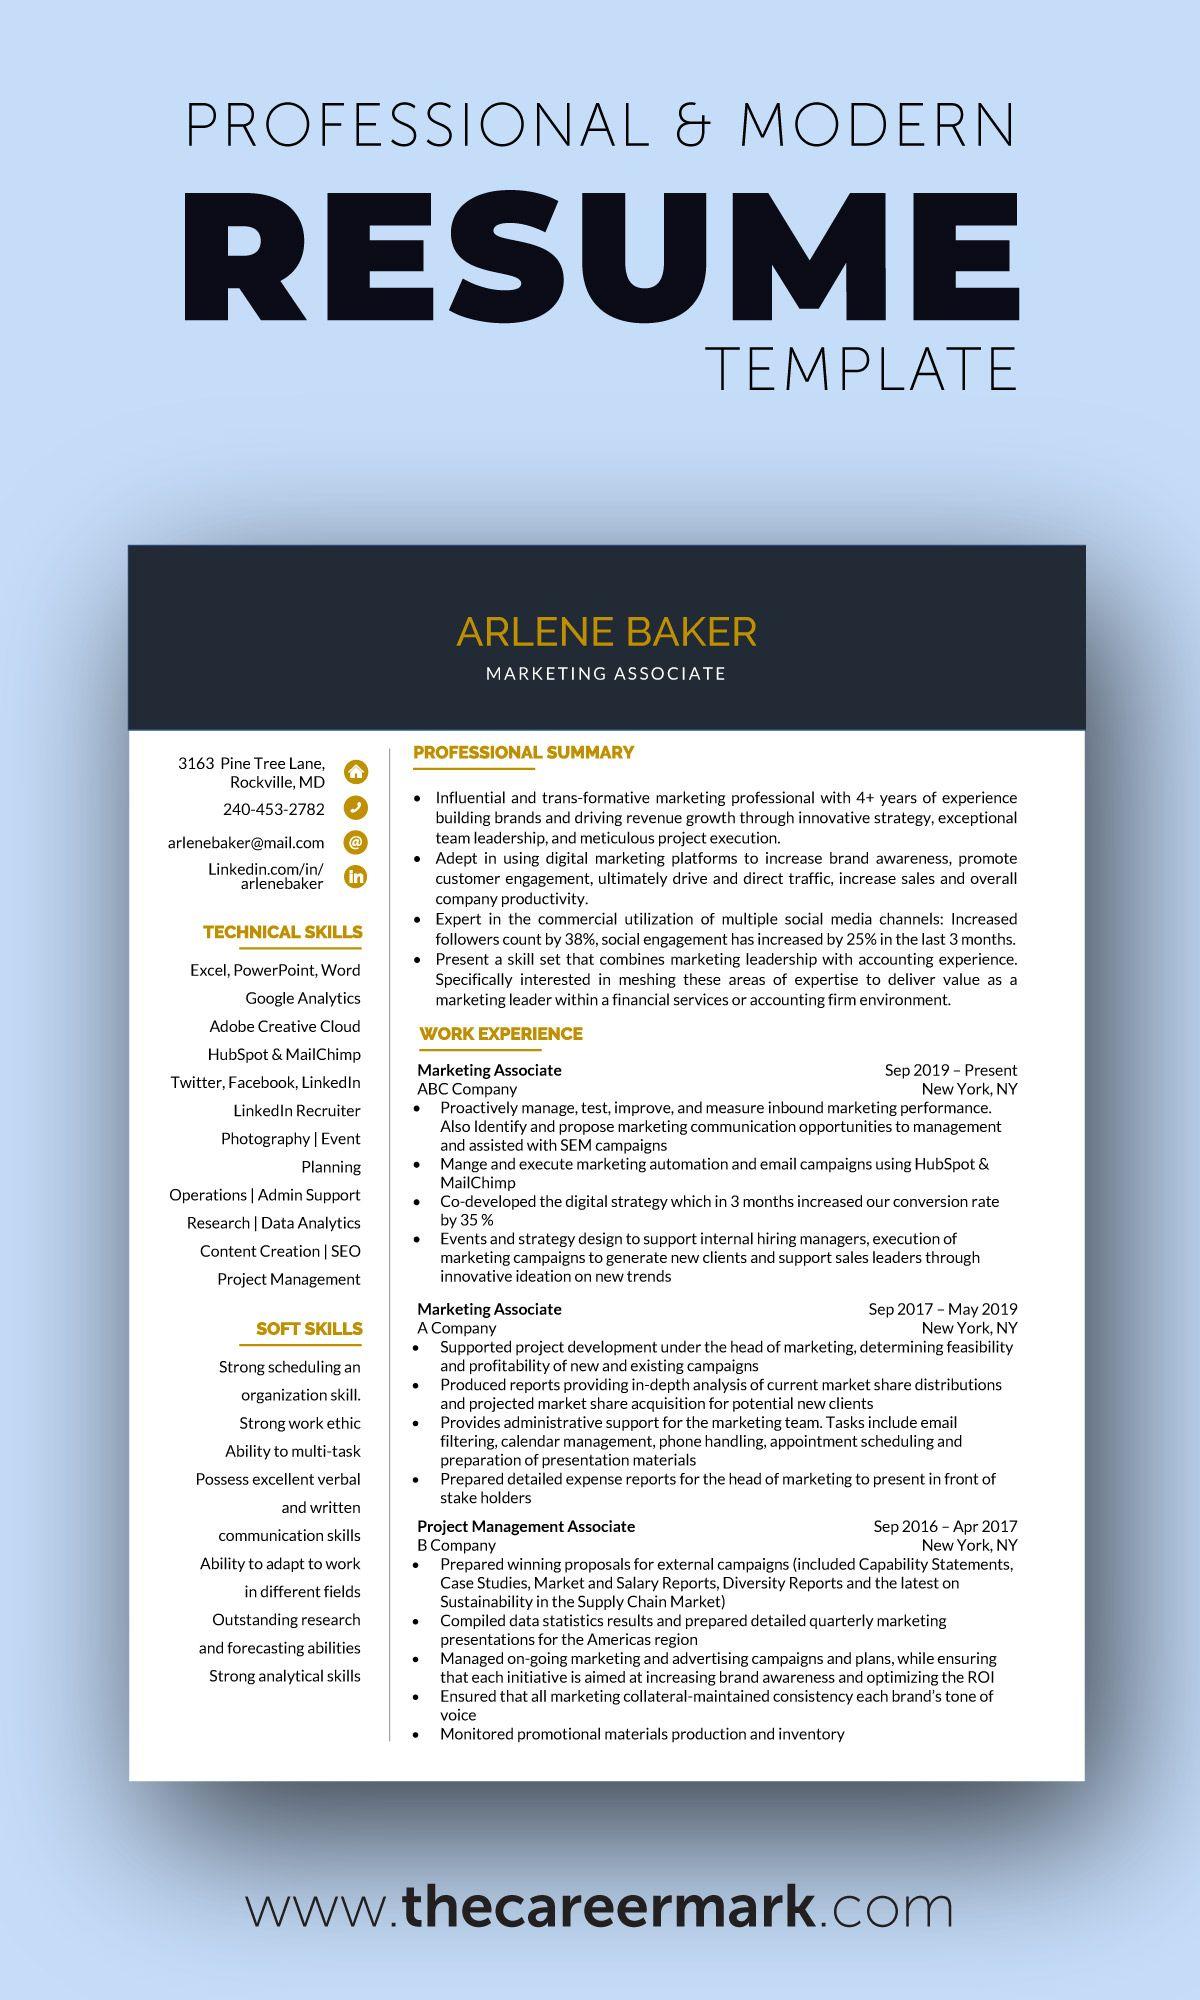 Professional modern resume templates in 2020 modern